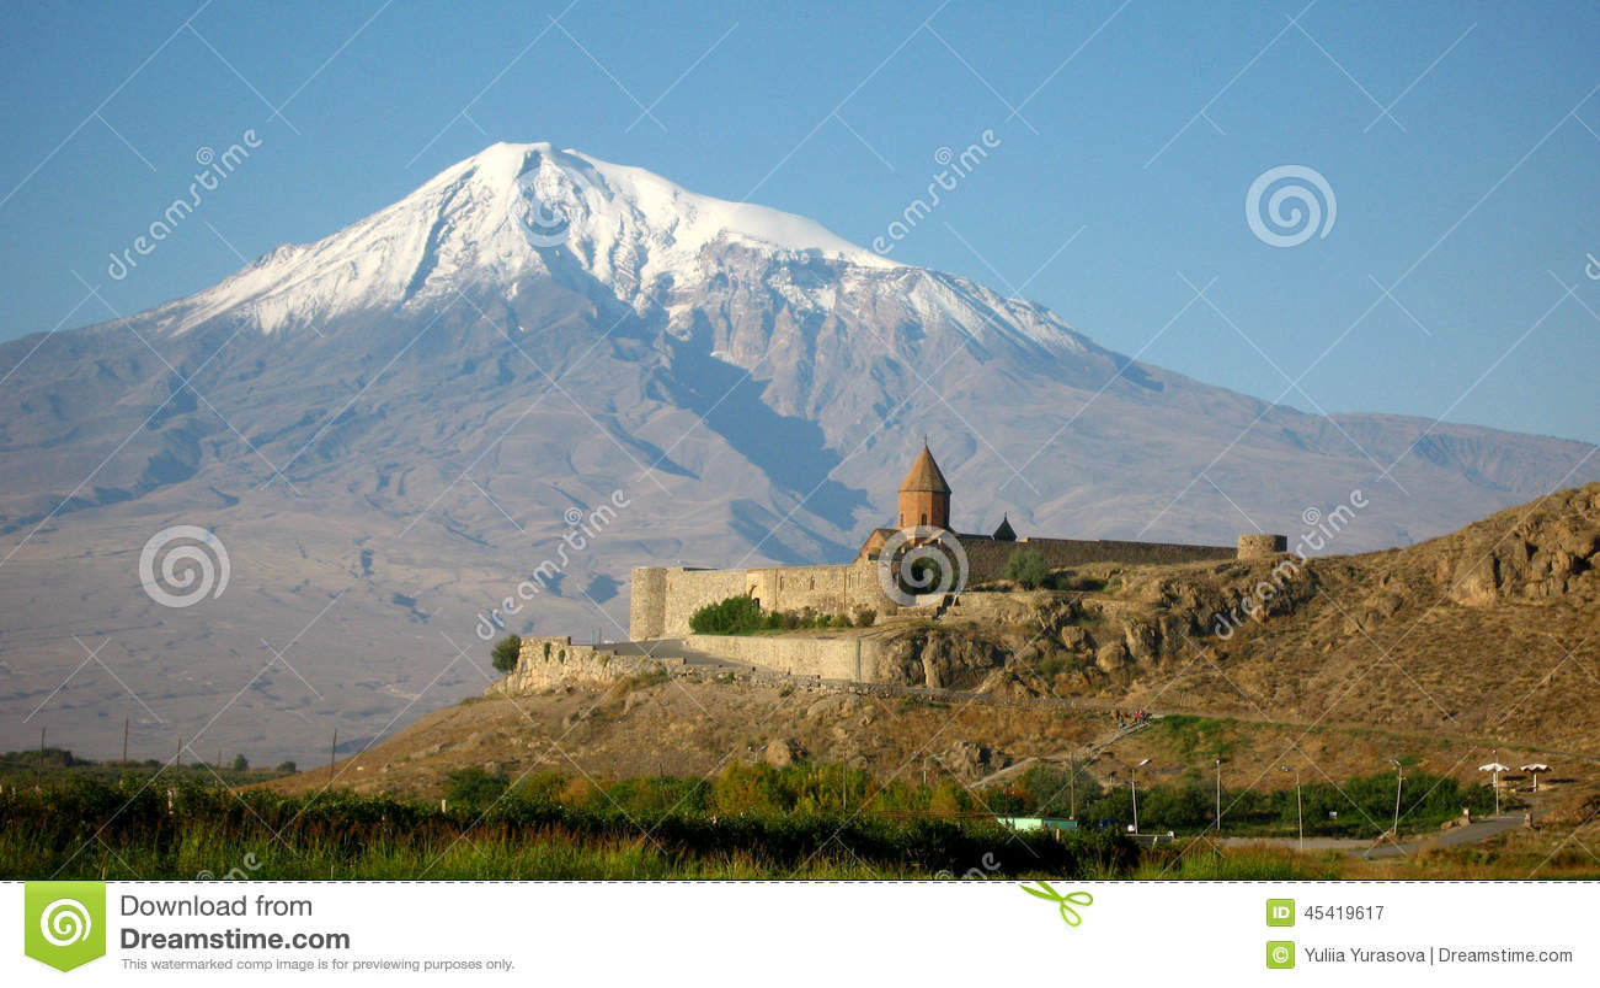 Ancient orthodox stone monastery in Armenia, Khor Virap and Mount Ararat